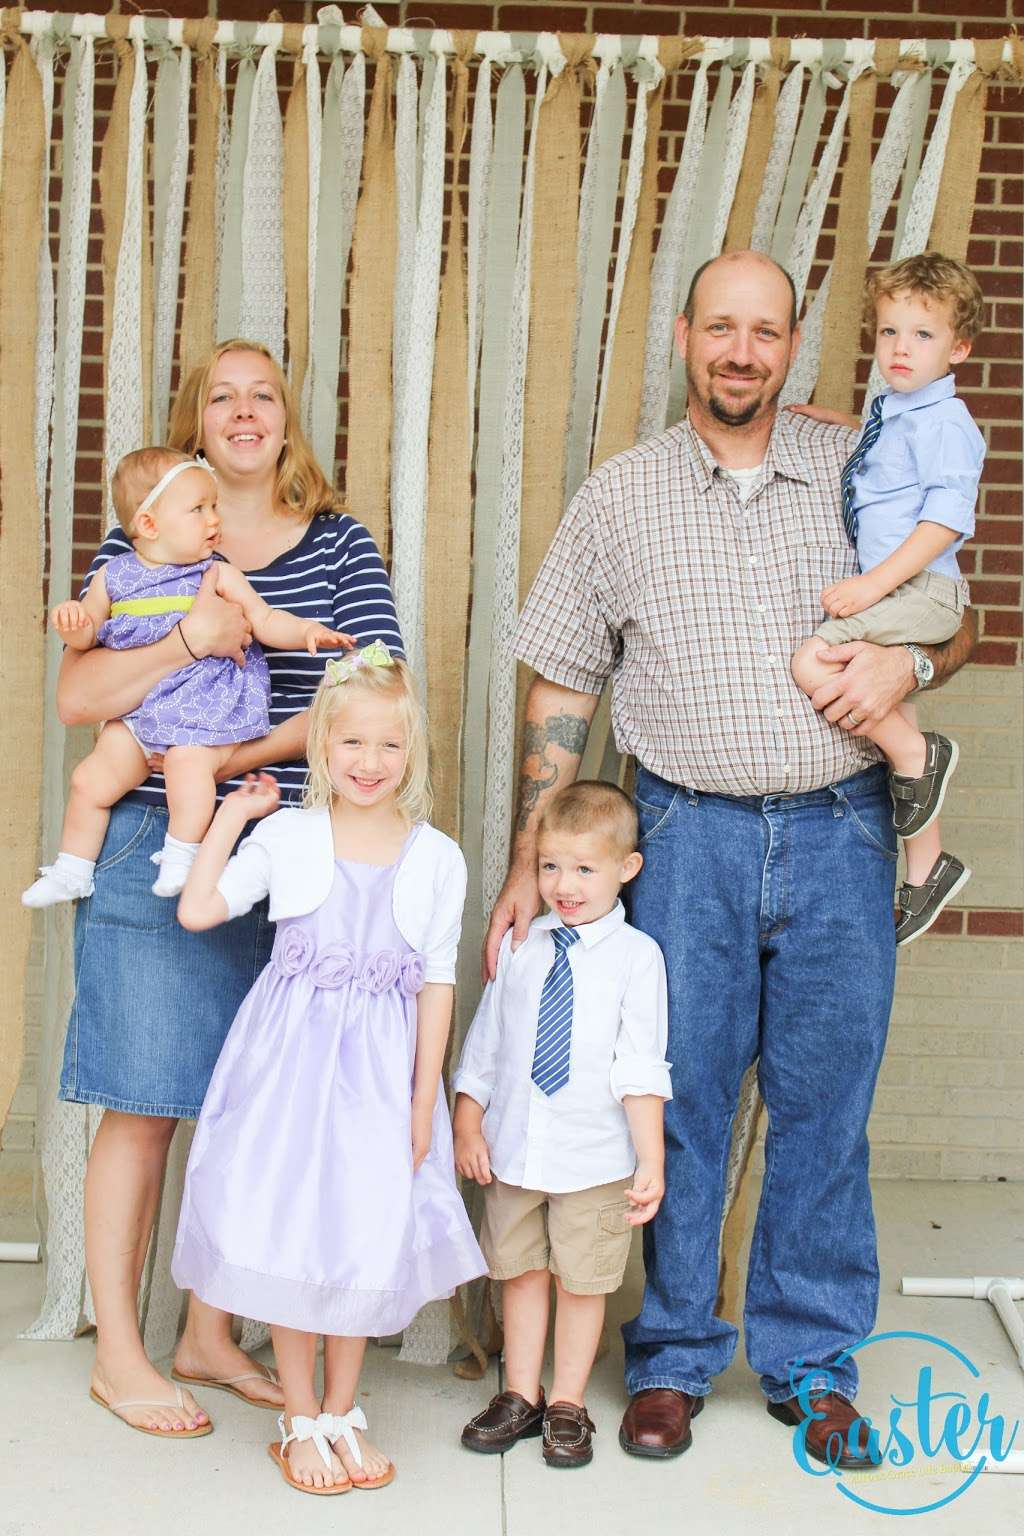 Grace Life Baptist Church - church  | Photo 4 of 10 | Address: 17333 Huffmeister Rd, Cypress, TX 77429, USA | Phone: (281) 373-9191